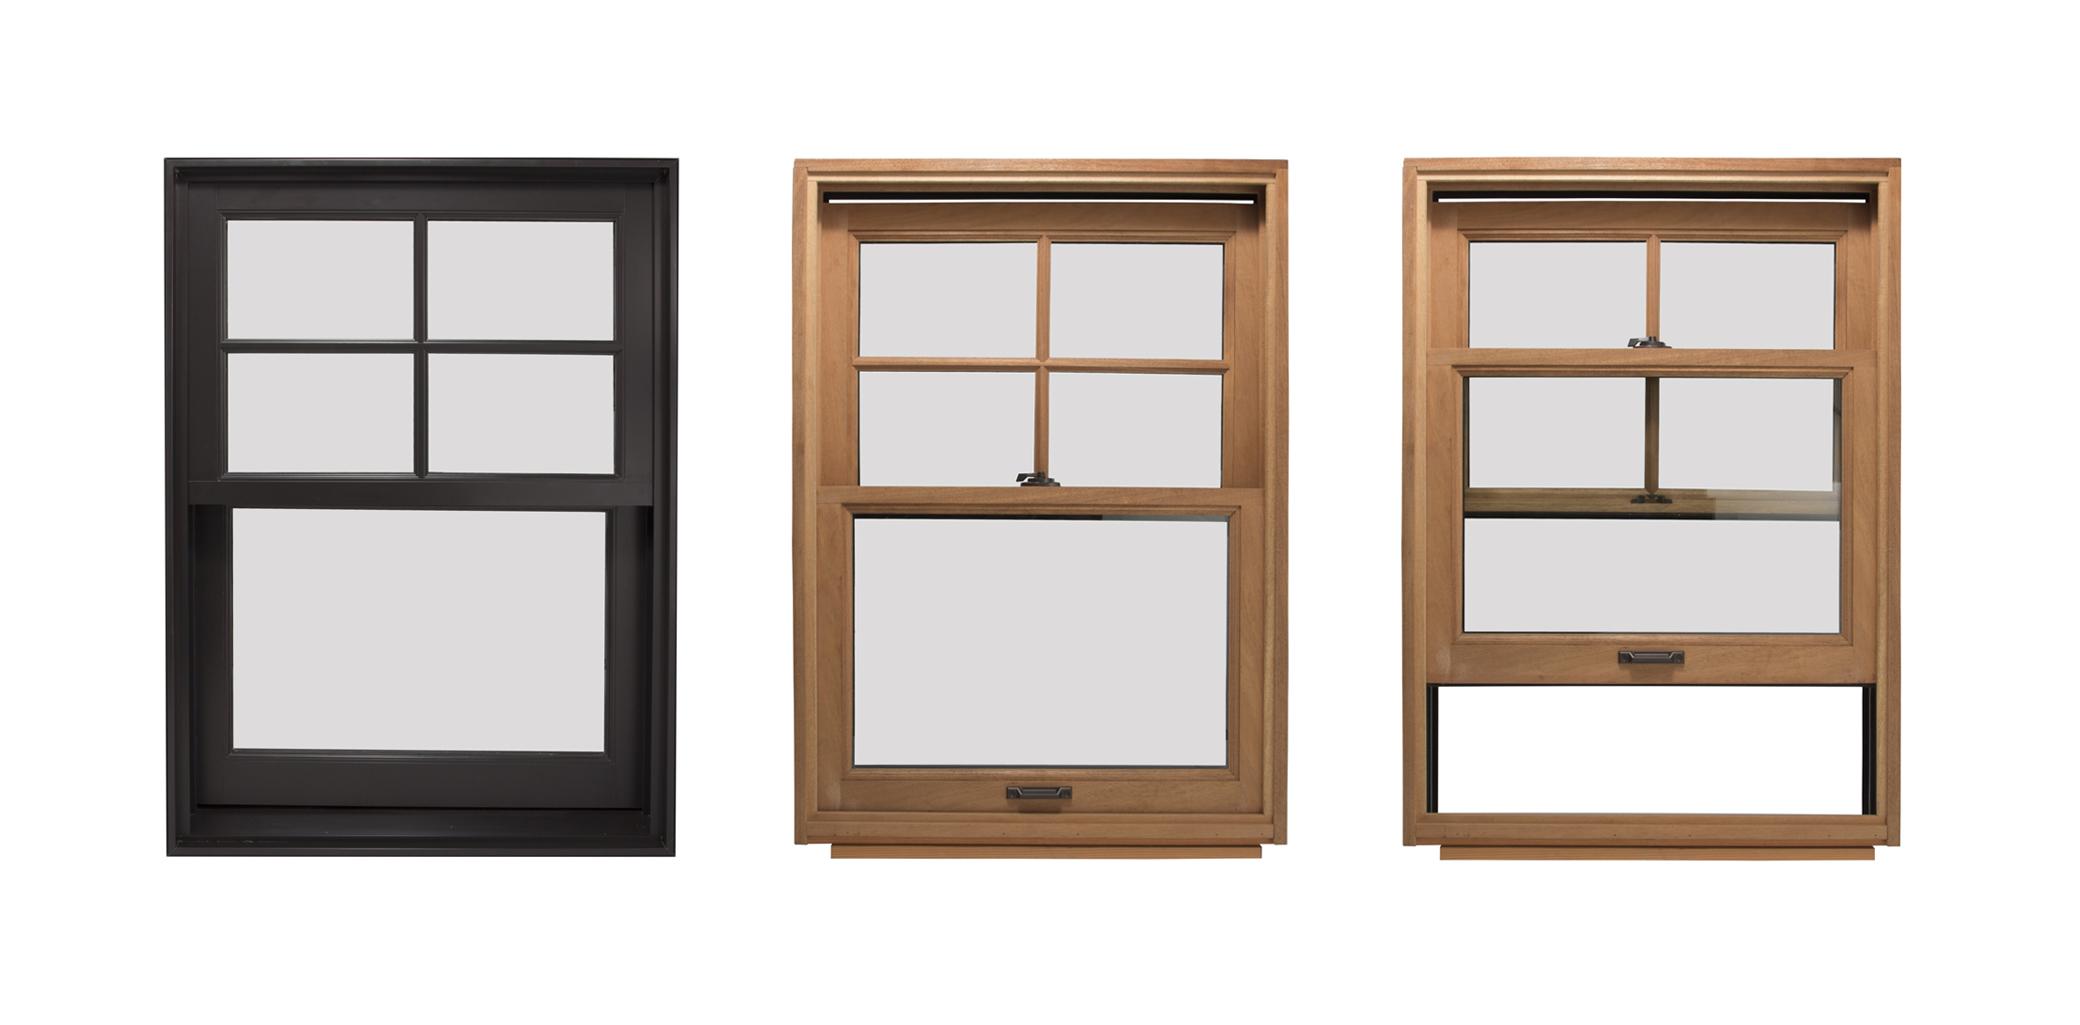 Double Hung Wood Windows : Double hung windows southland doors